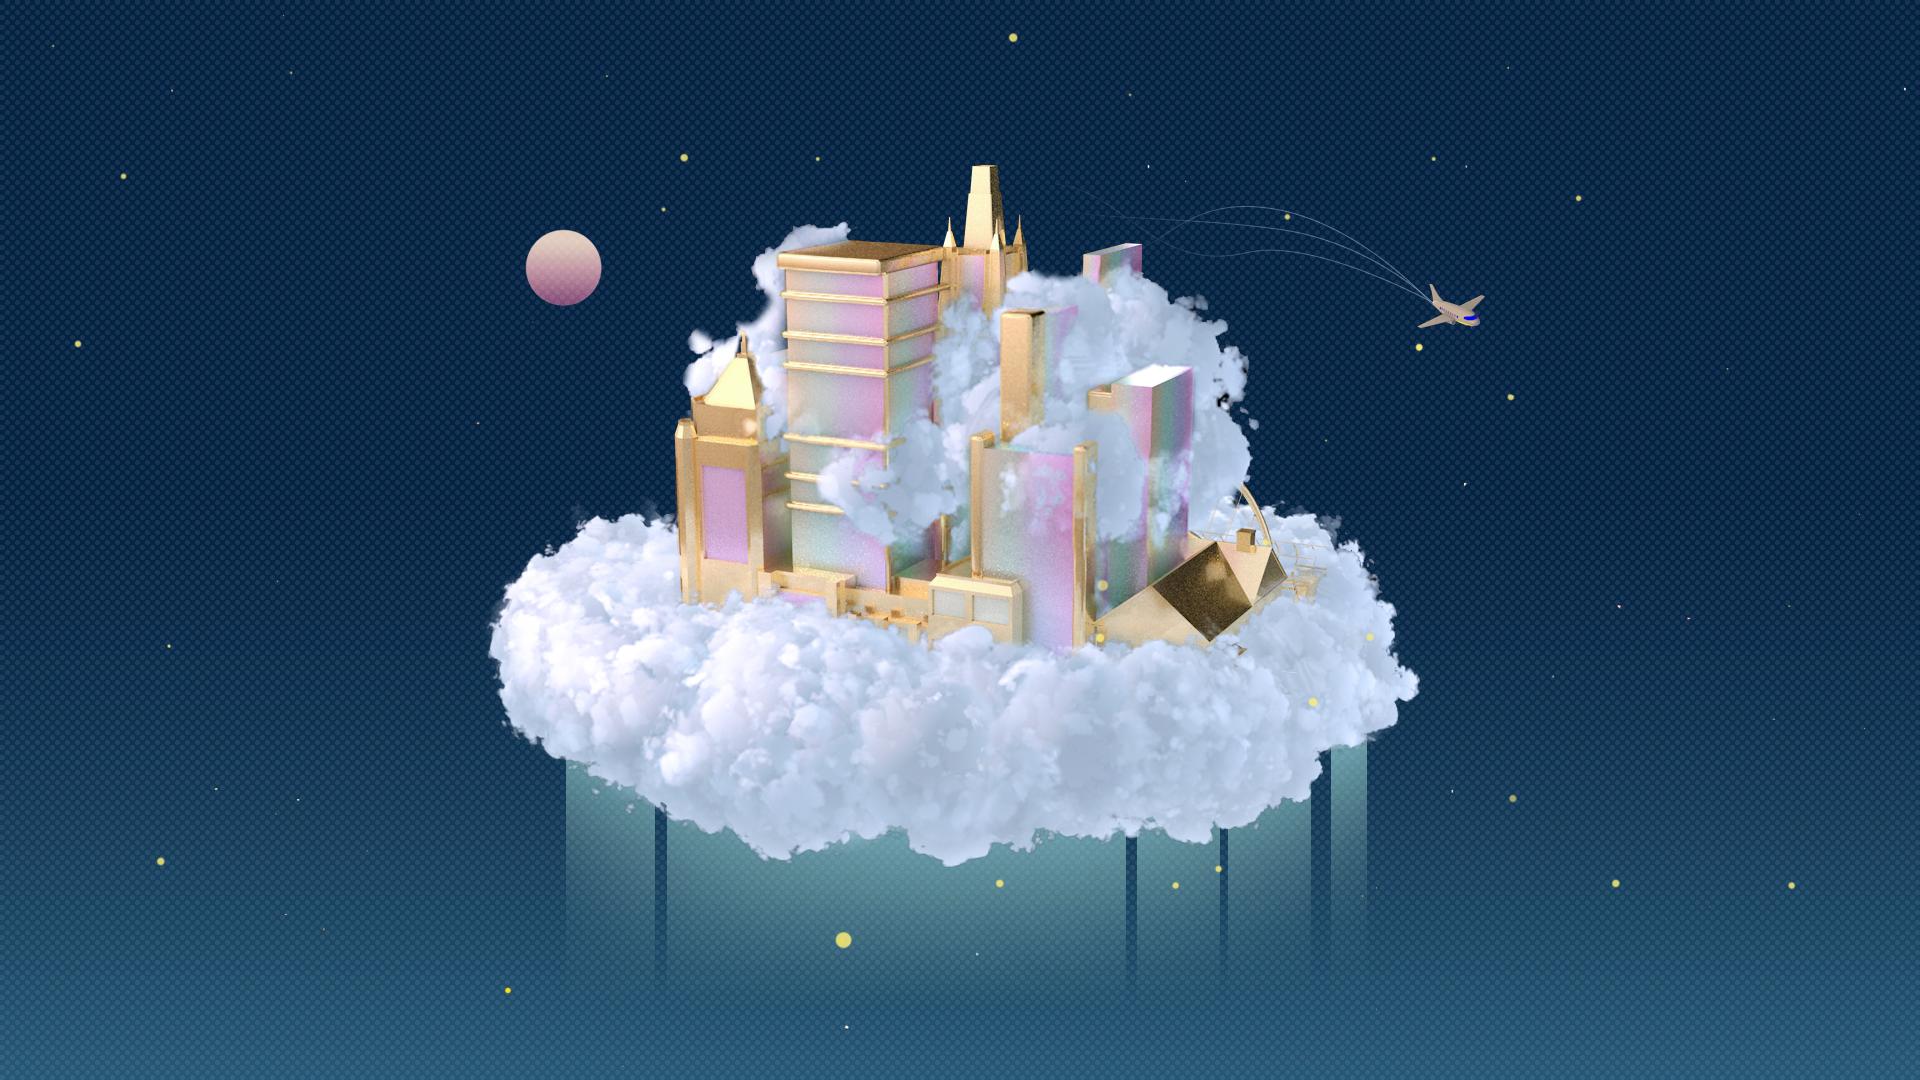 cloudcity0012.jpg